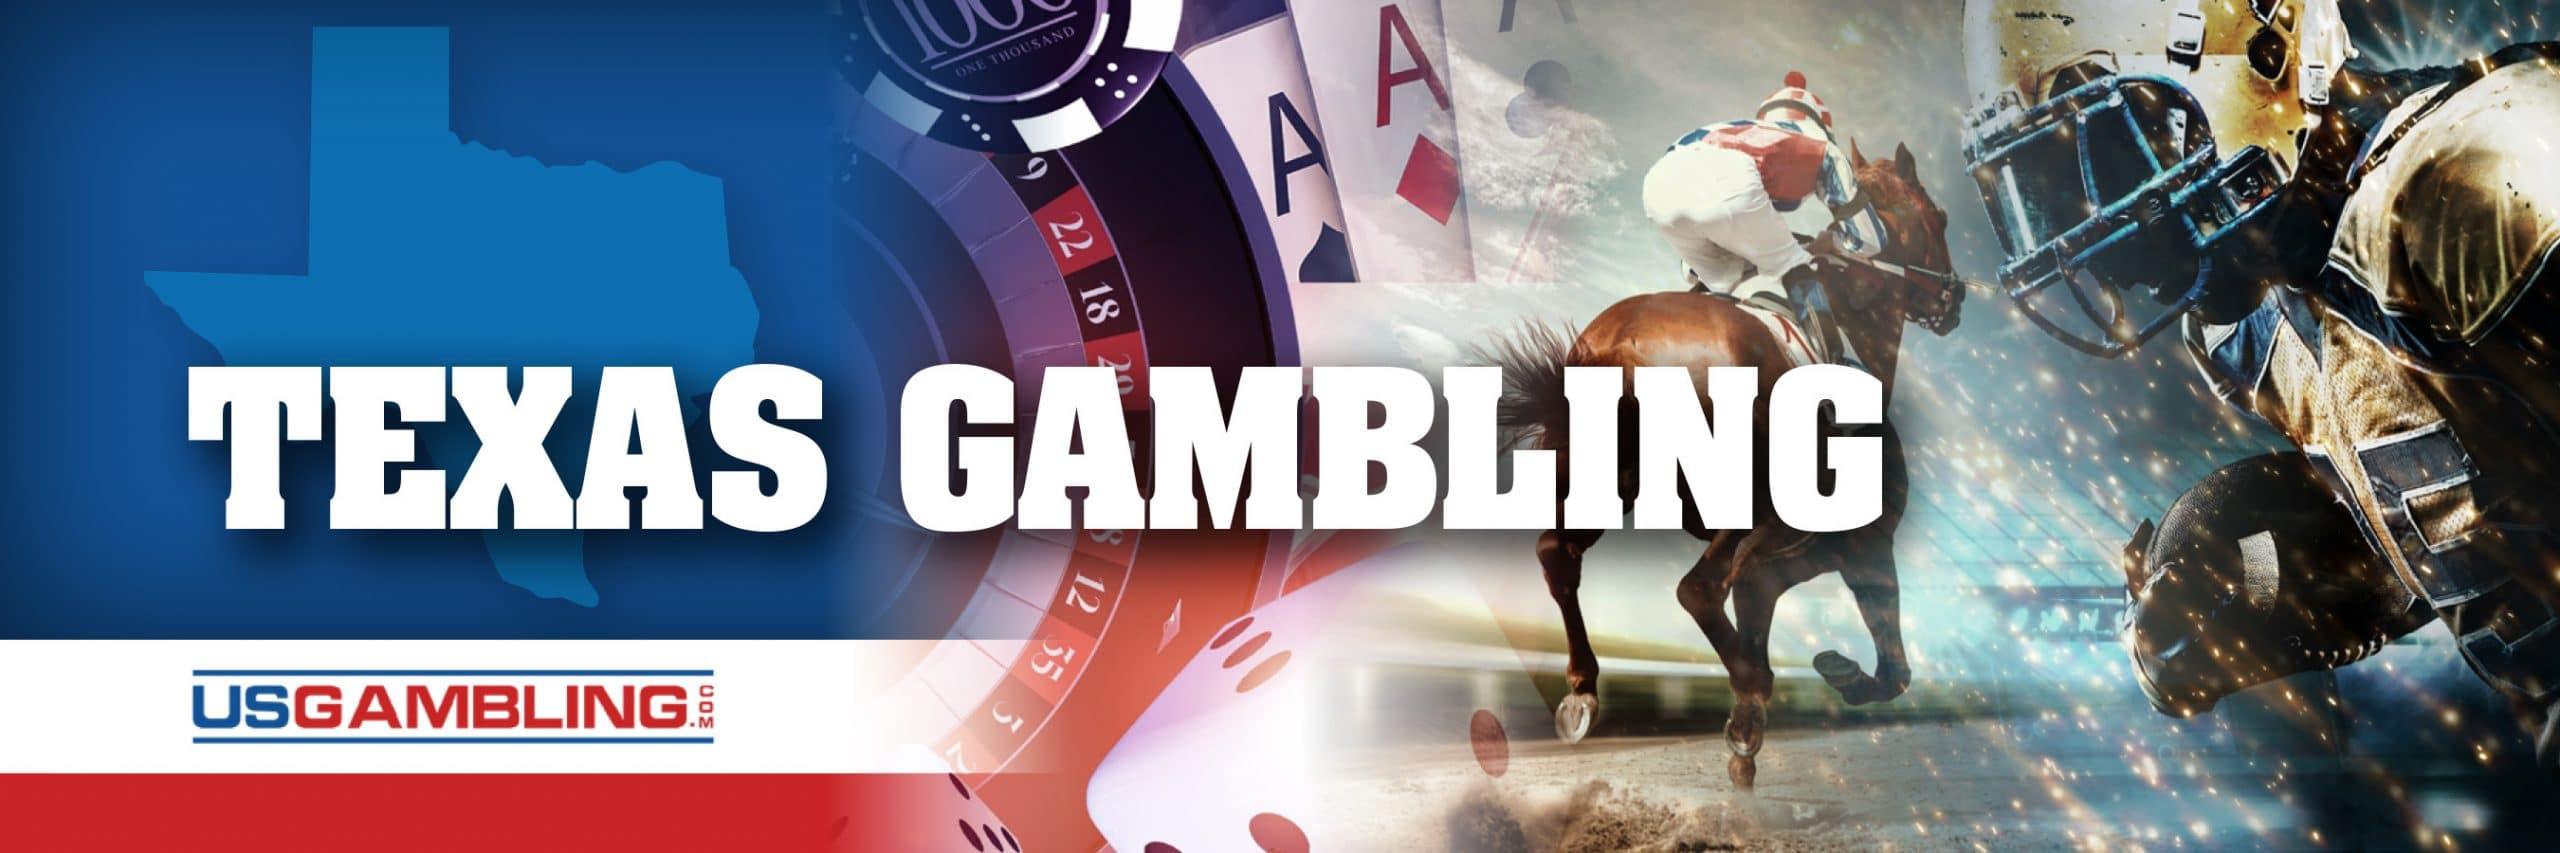 Legal Texas Gambling